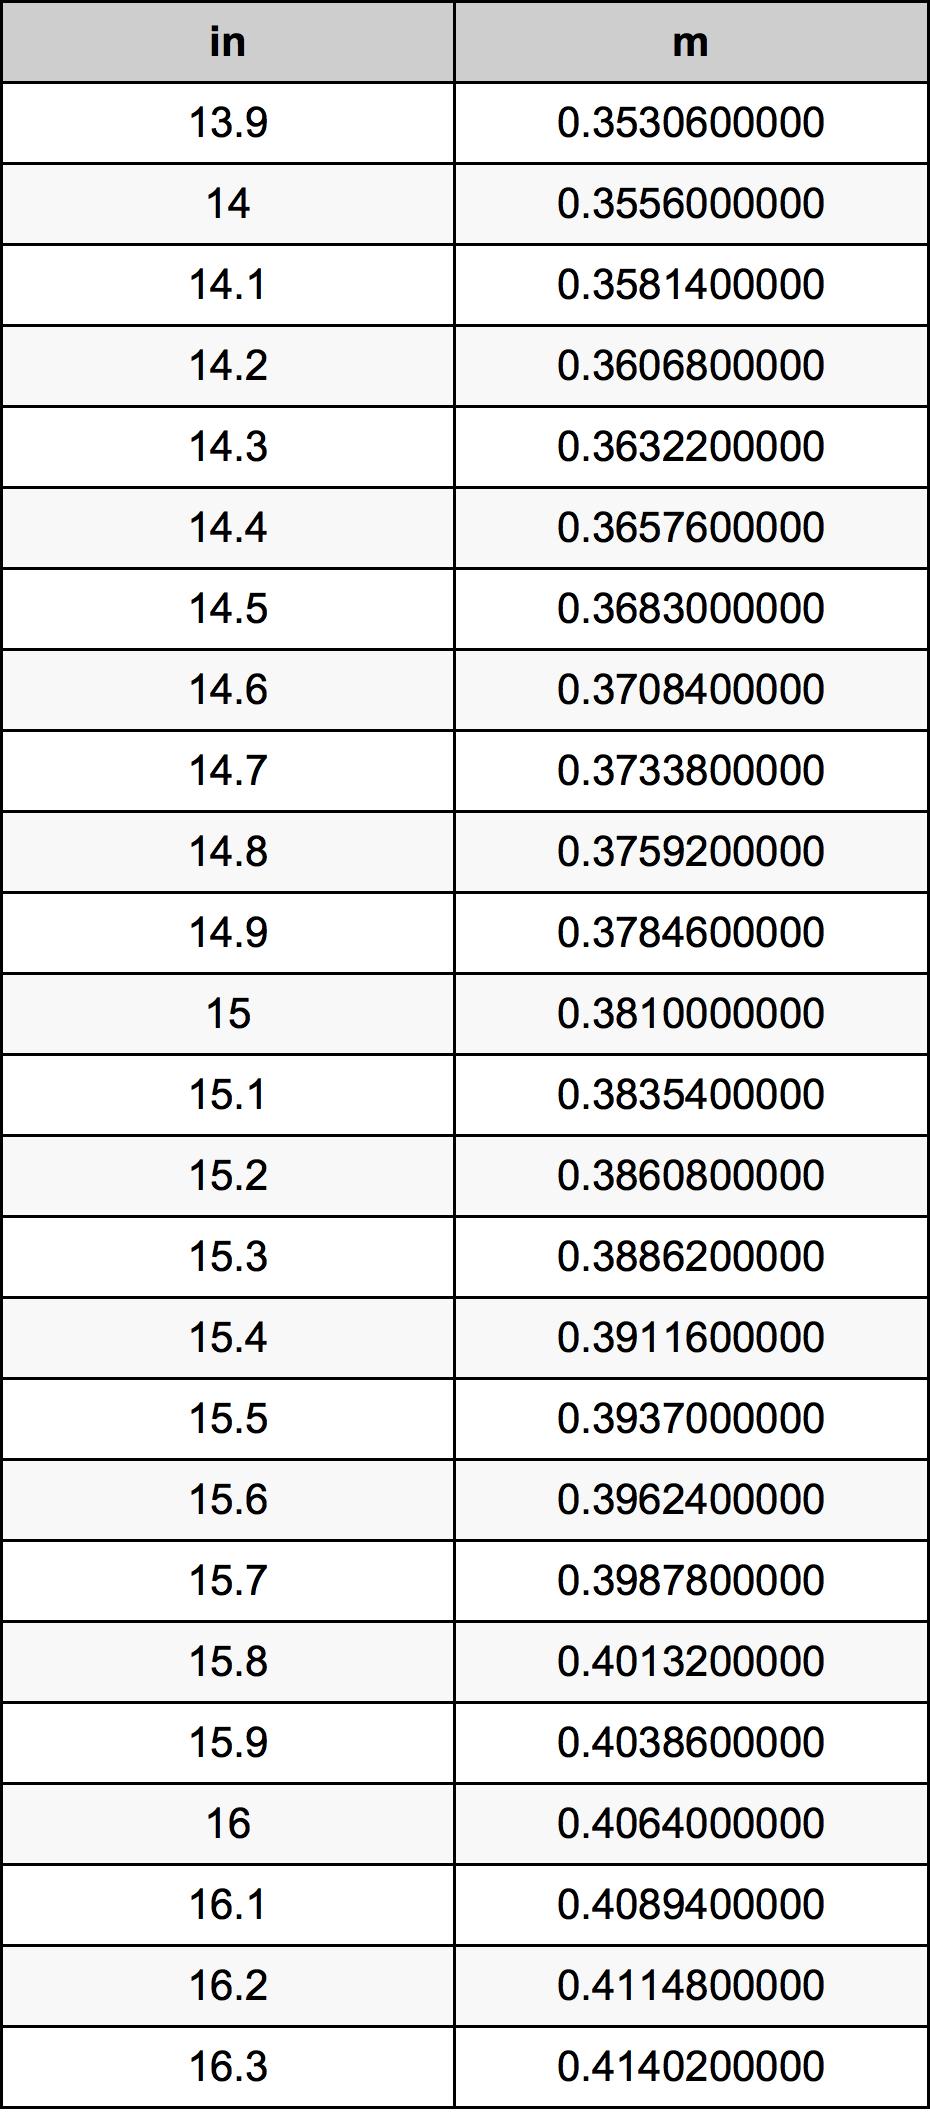 15.1 इंच रूपांतरण सारणी